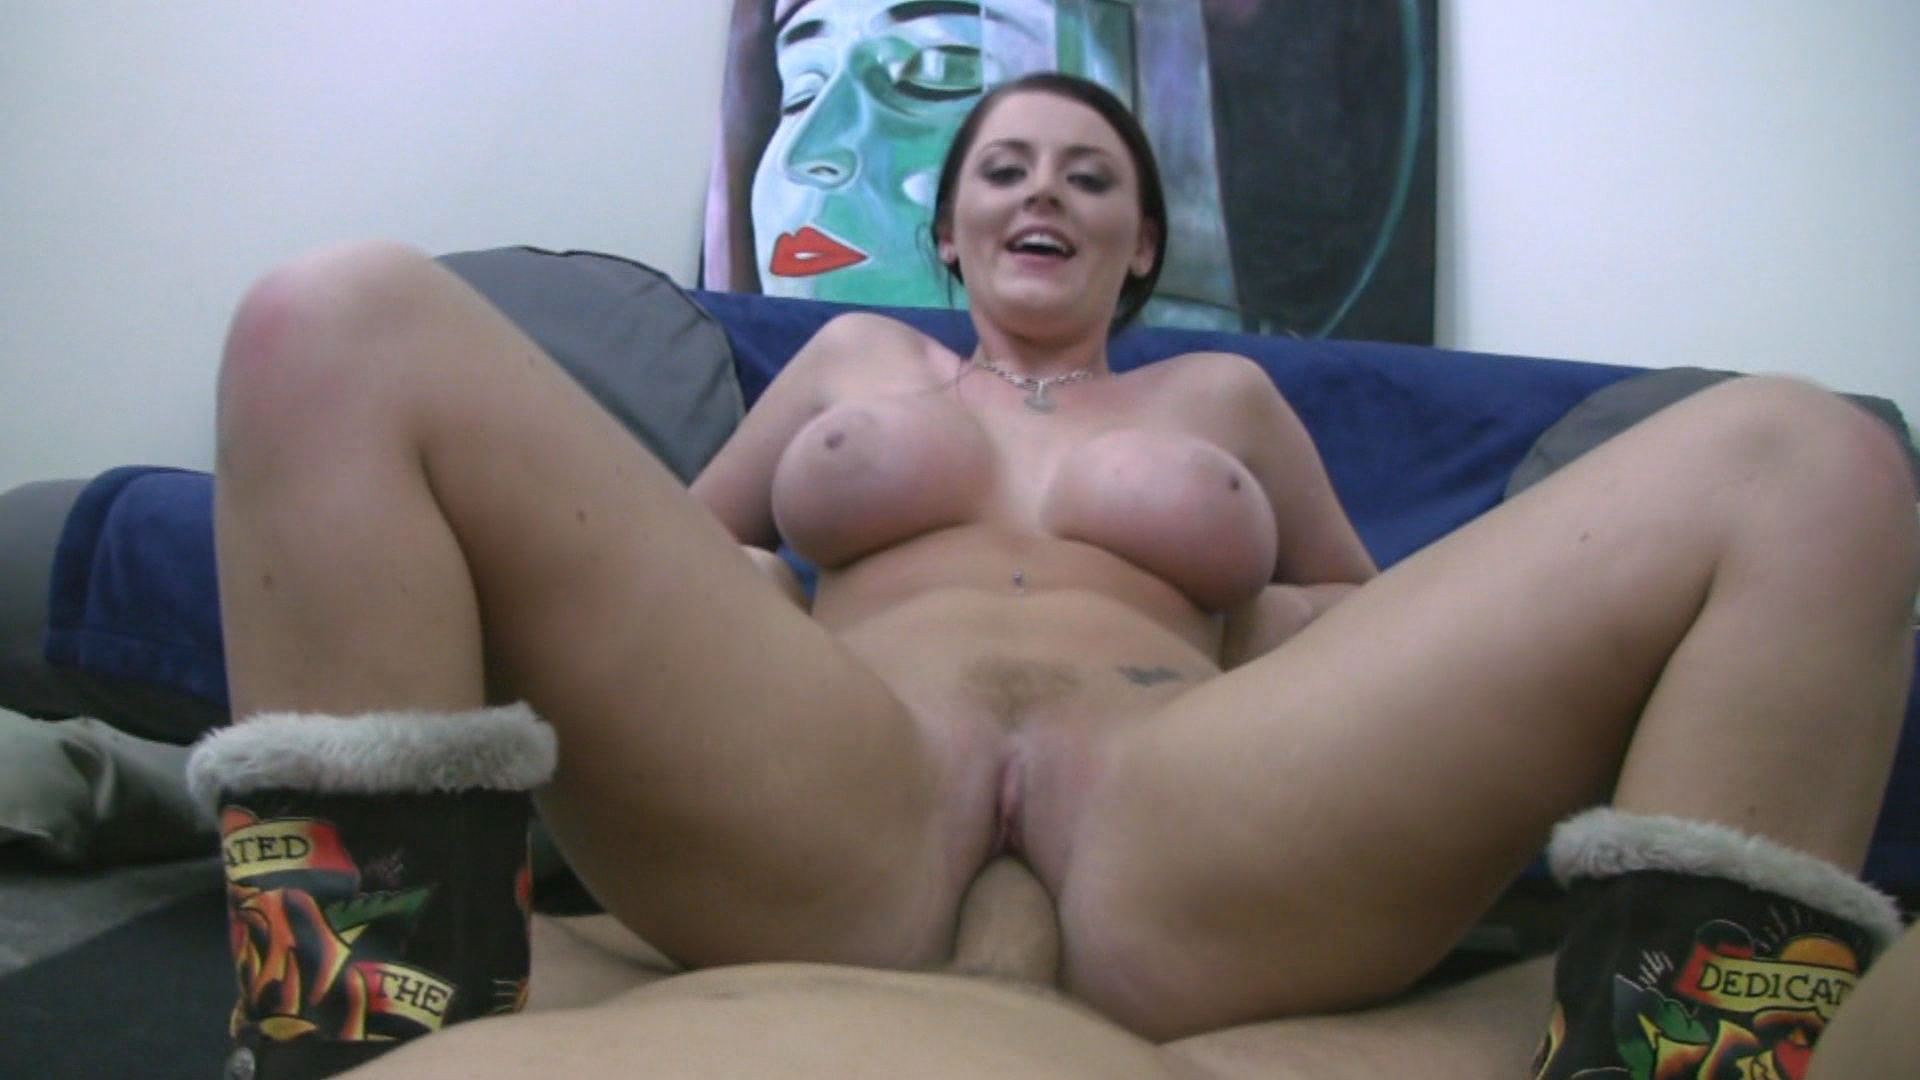 I Am A Monster Cock Virgin 3 xvideos